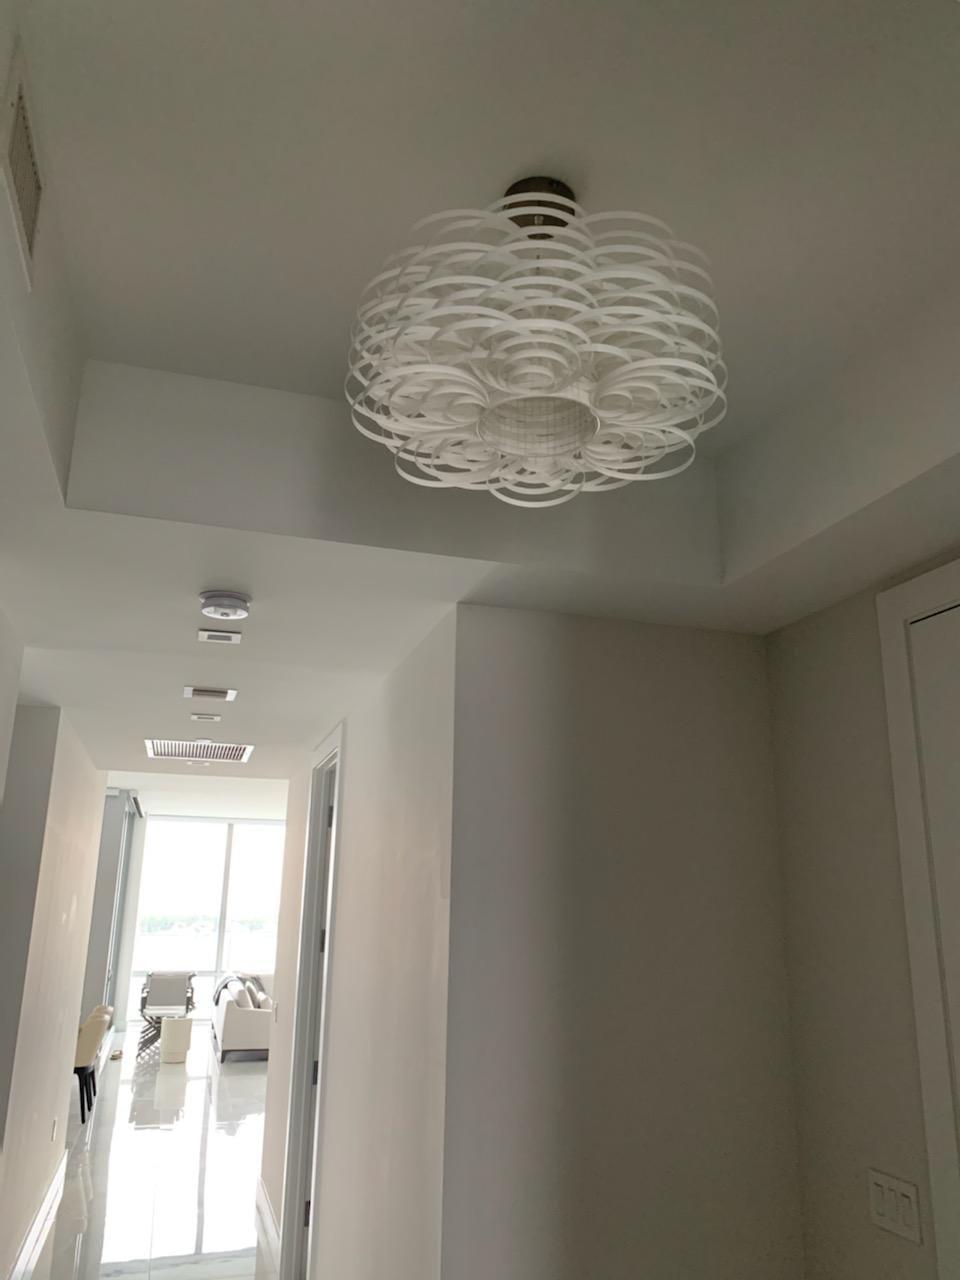 Custom Flower Decorative Light Fixture